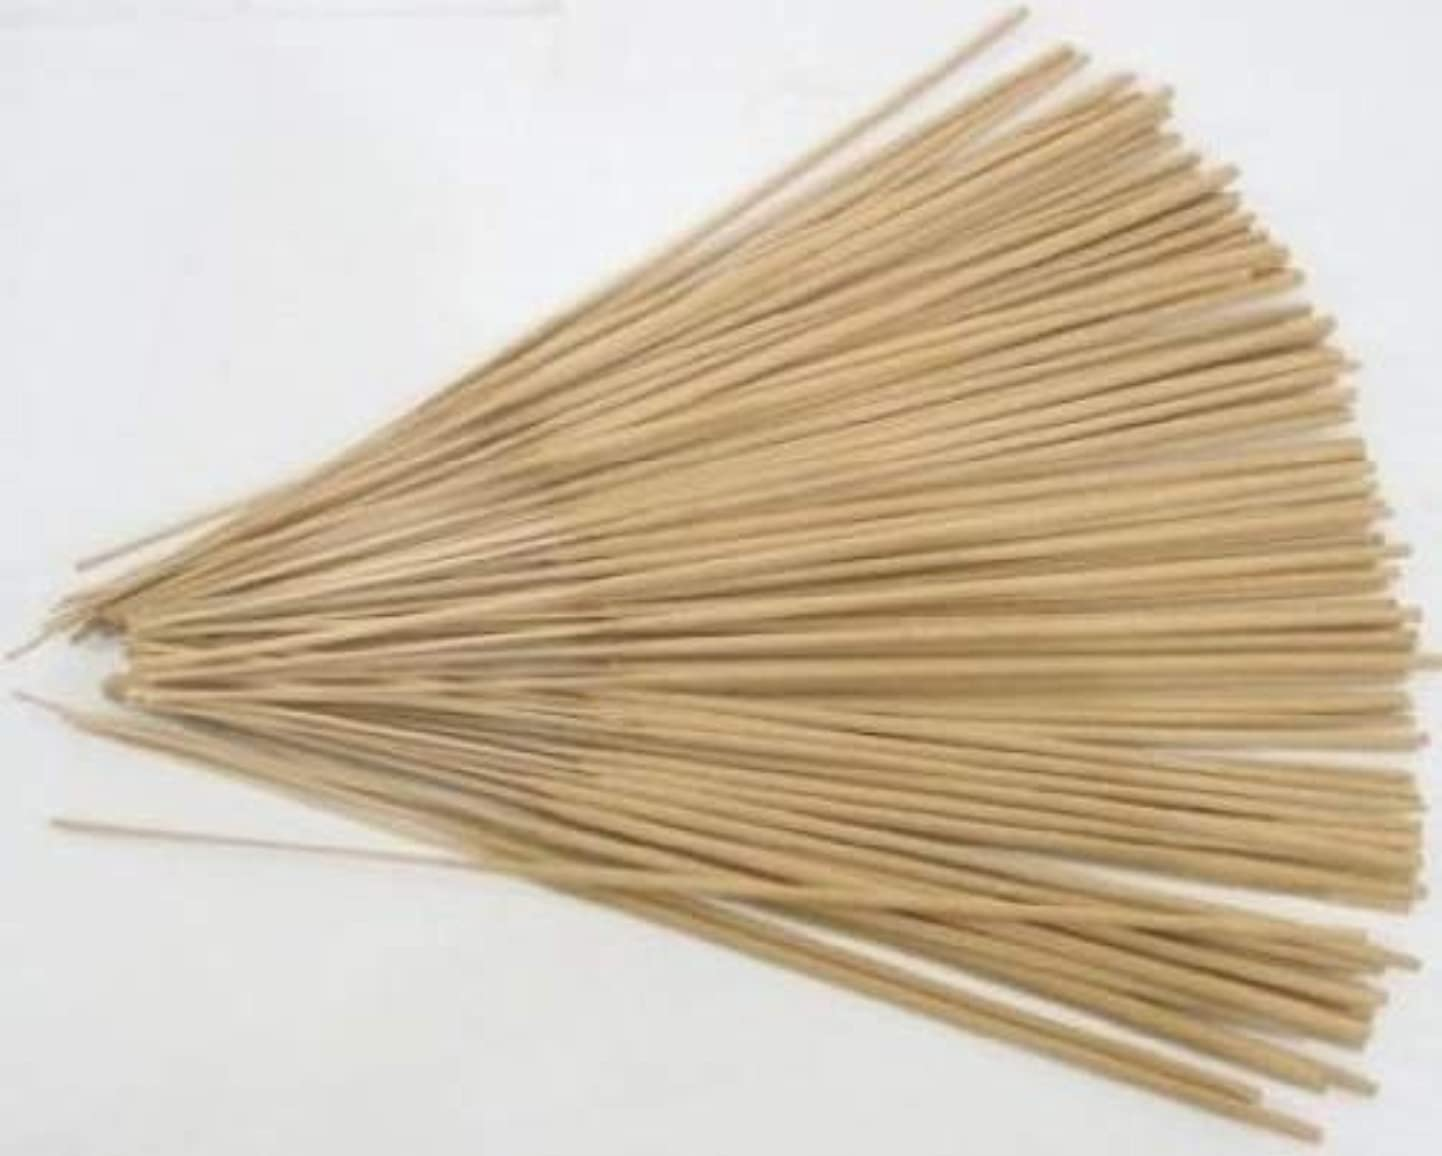 原子炉冷凍庫布Unscented Incense Sticks, 1000 pack